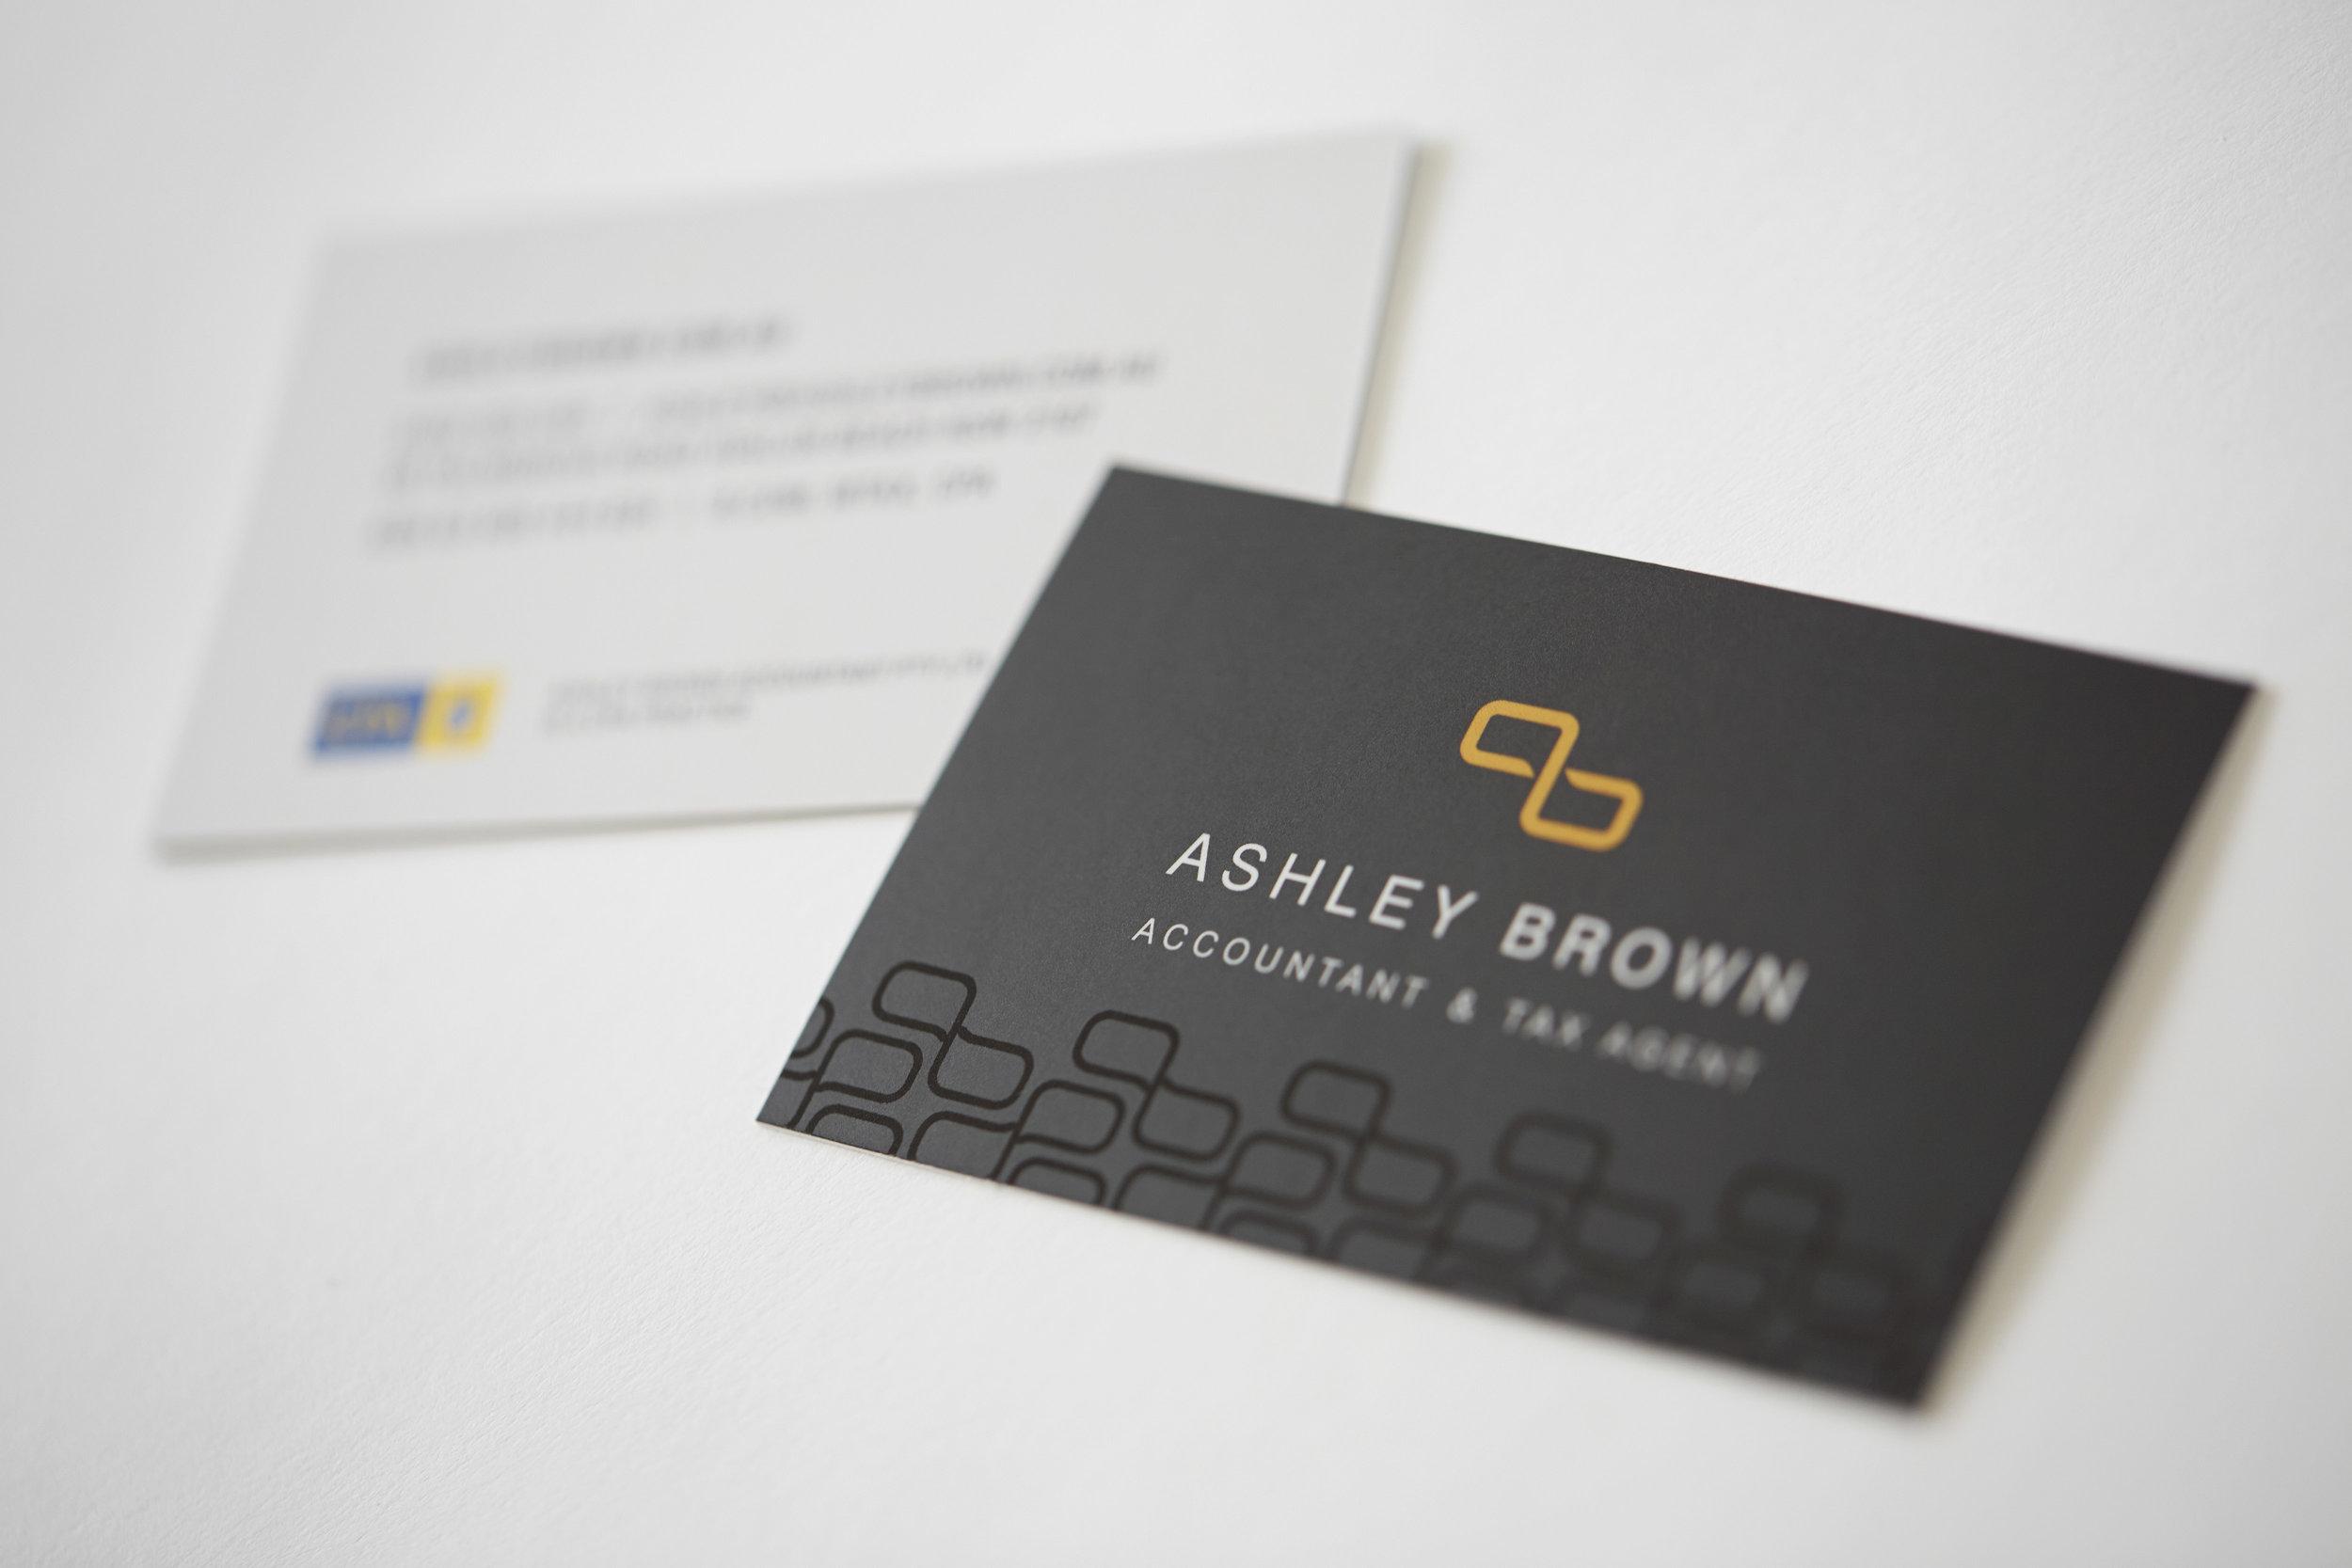 AB2_card2_10625.jpg